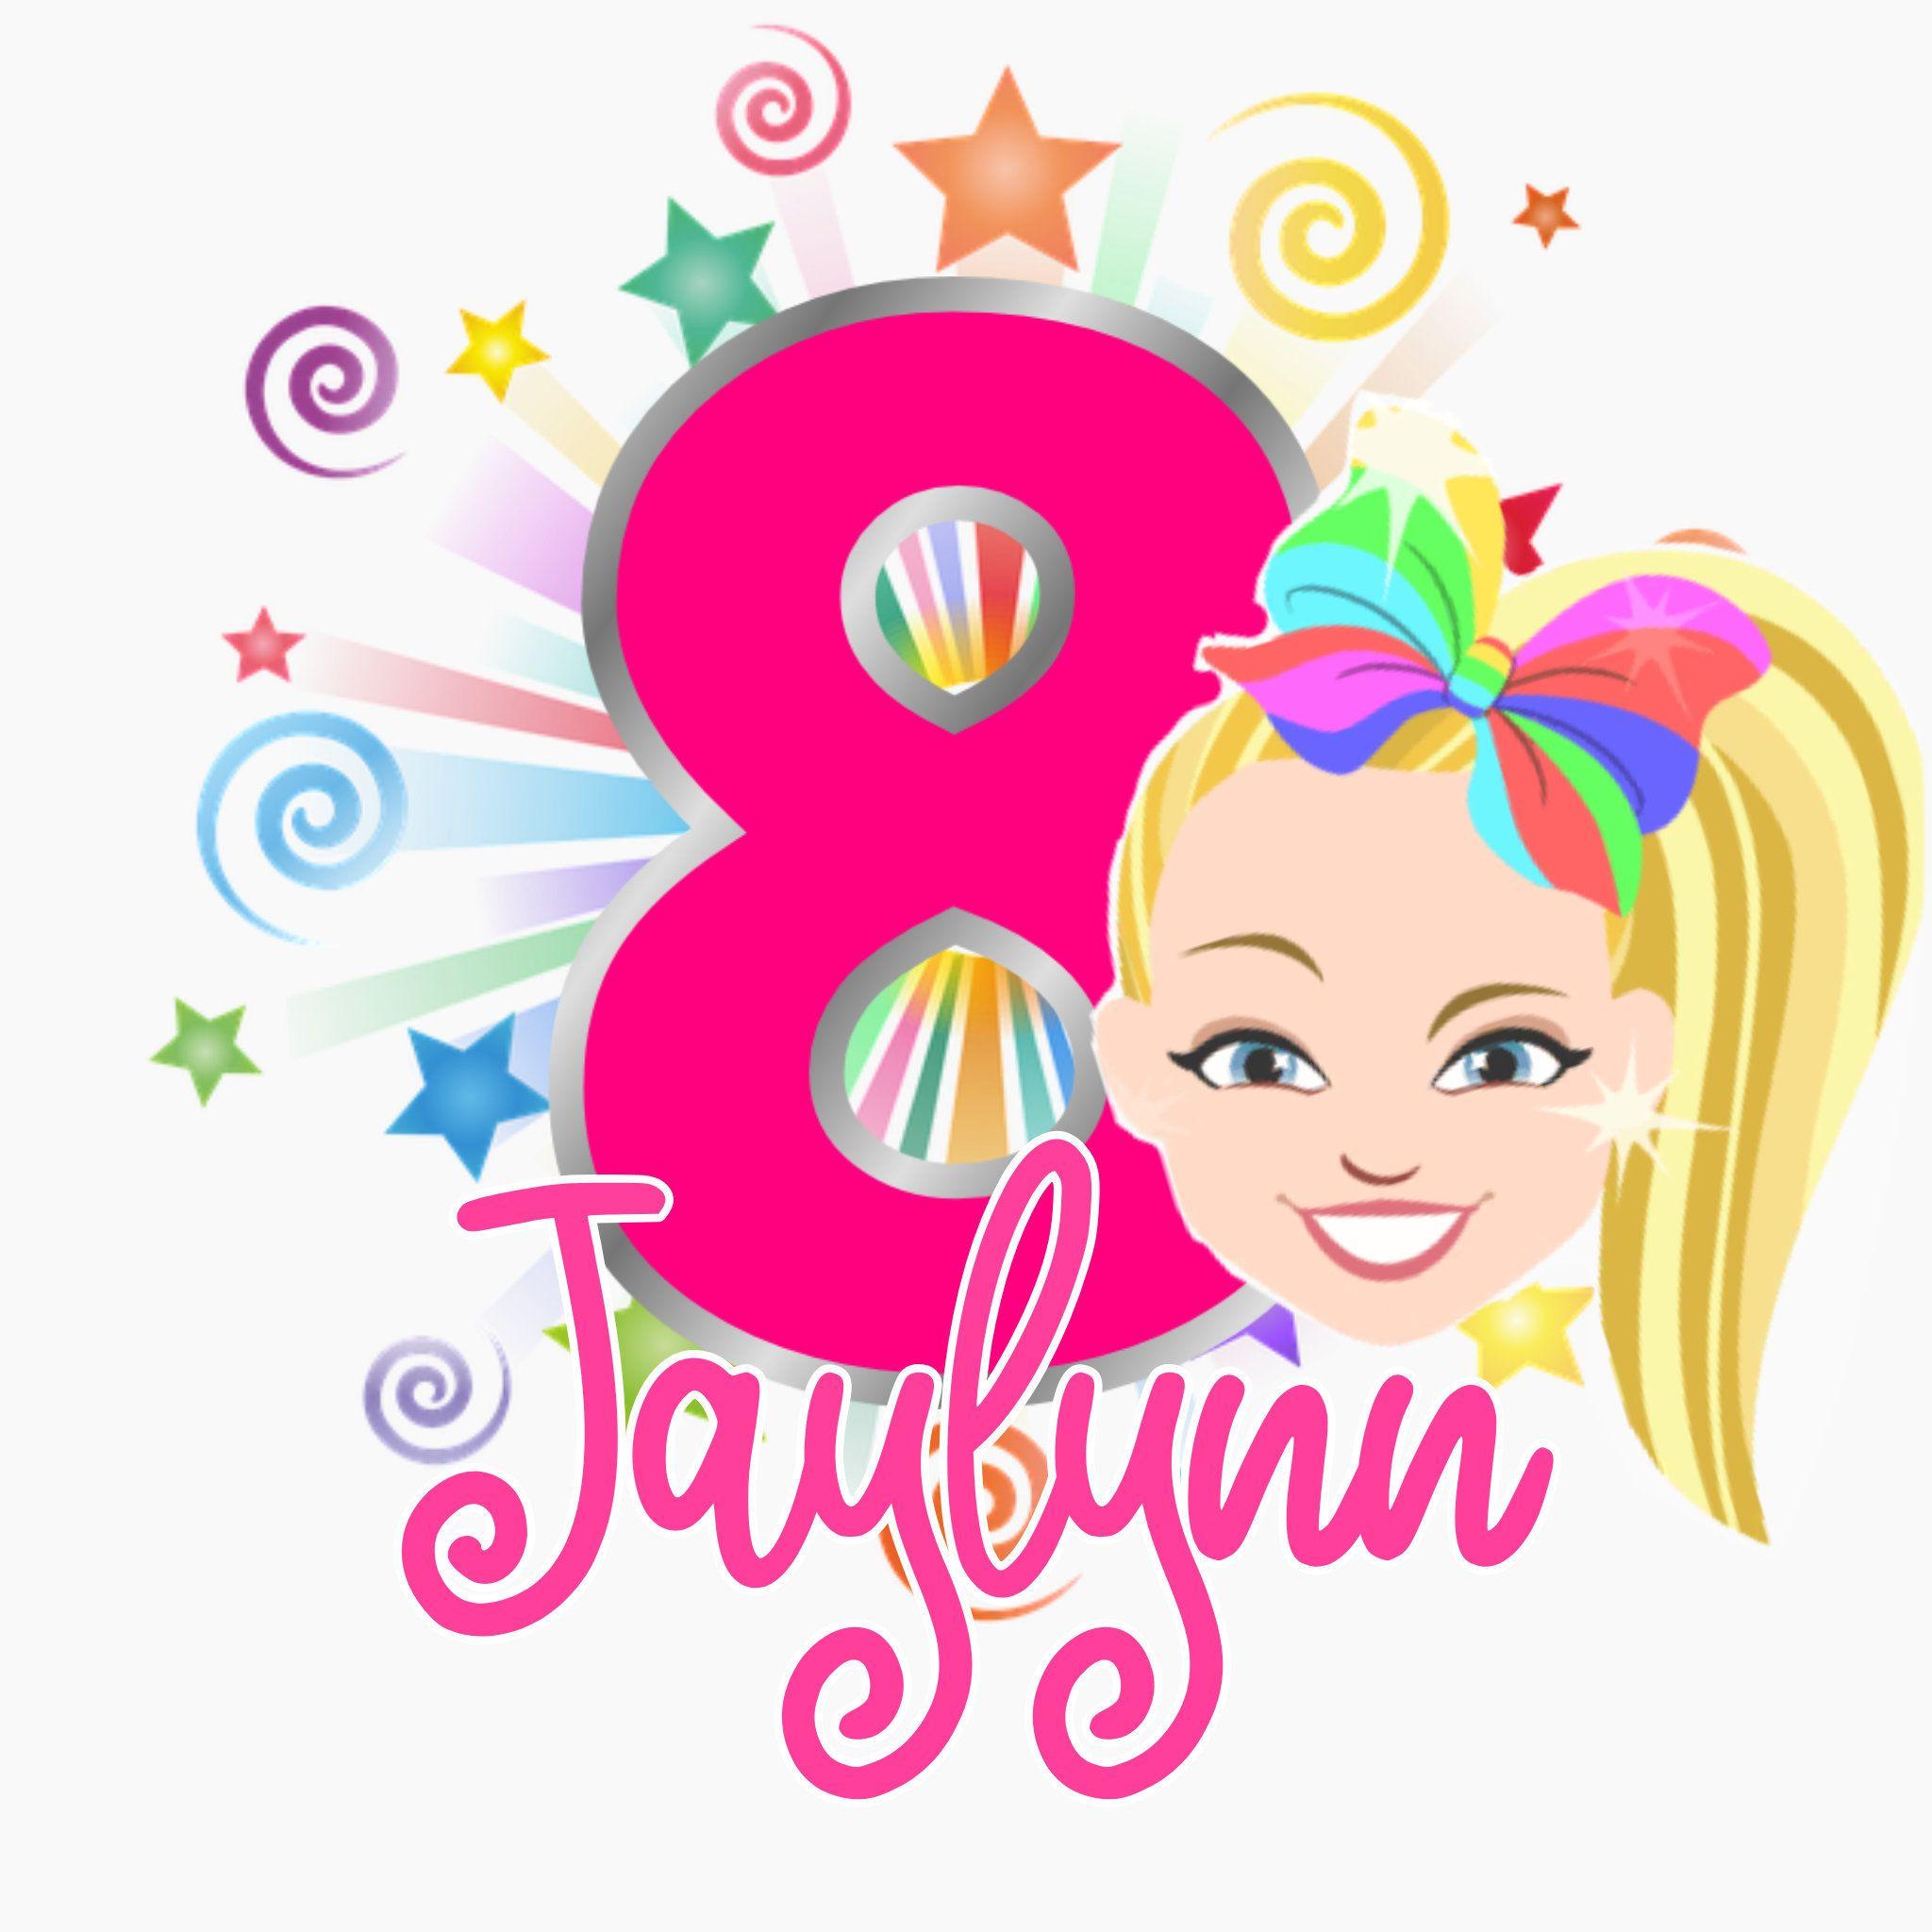 48+ Jojo siwa rainbow clipart ideas in 2021